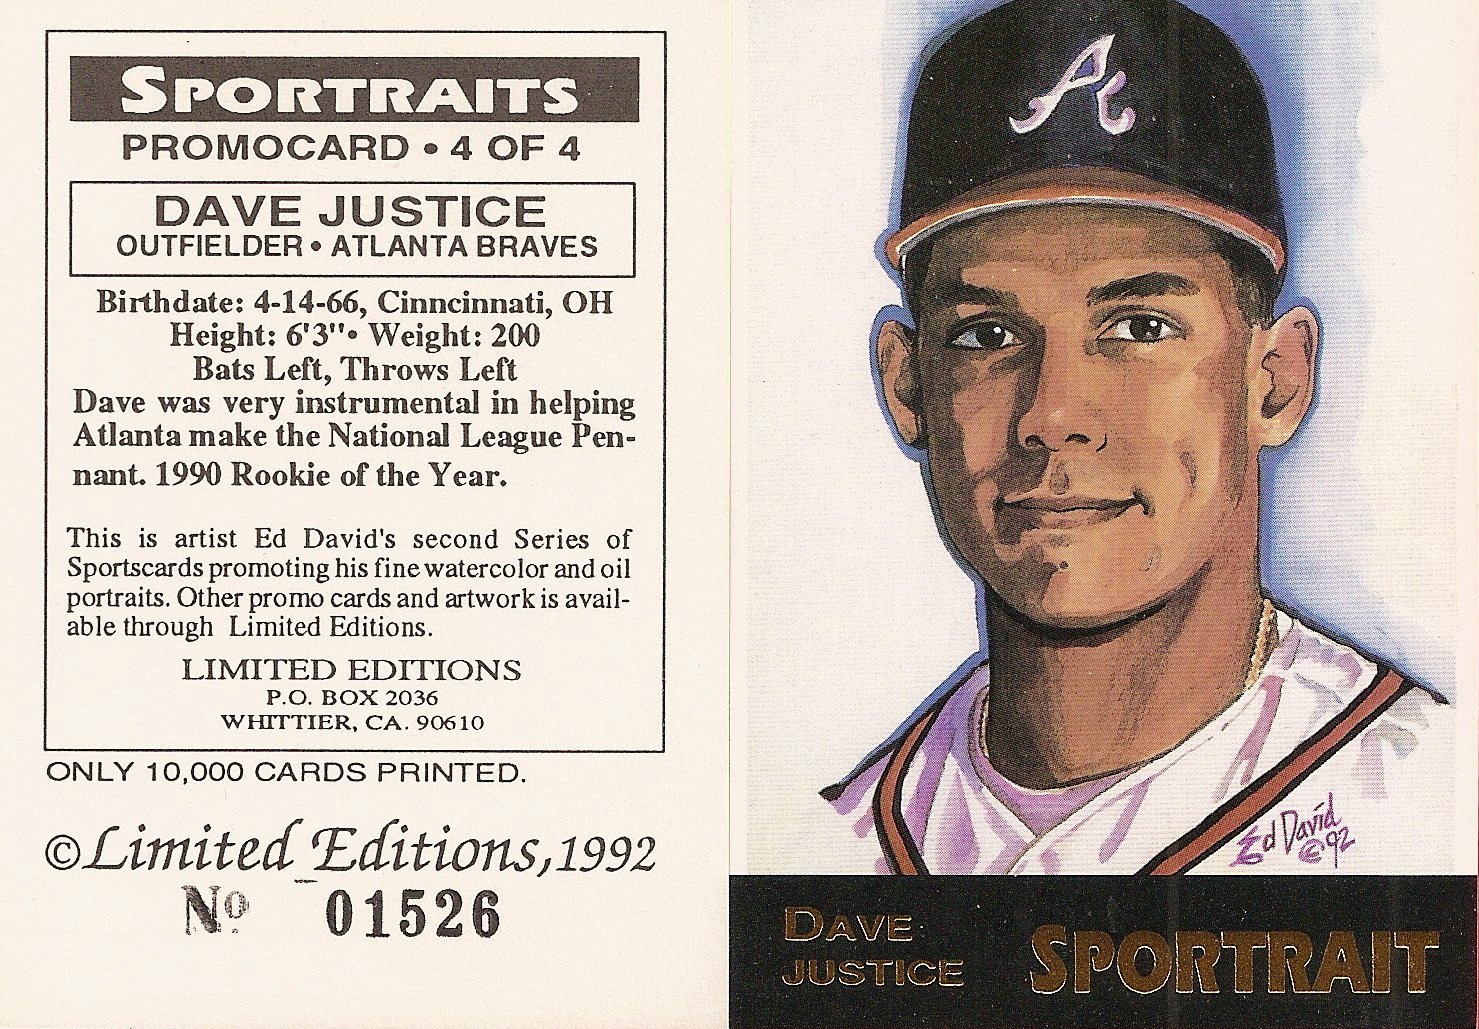 1992 Ed David Sportraits